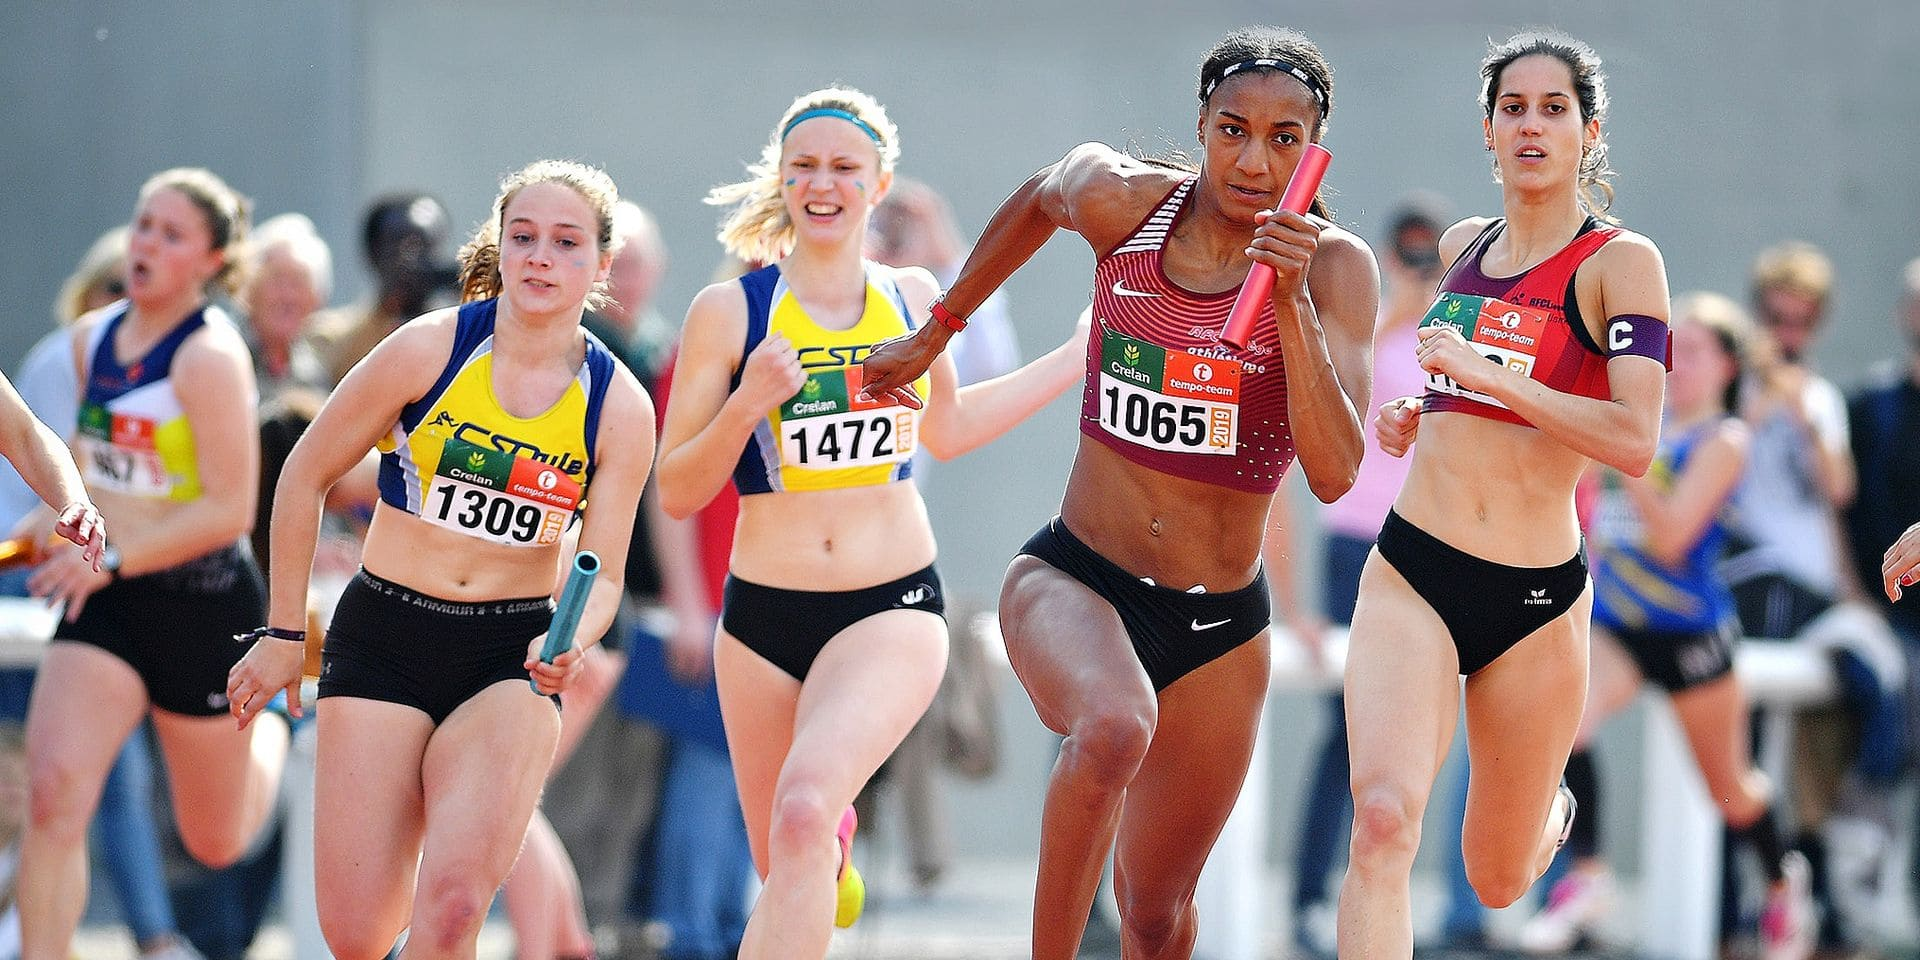 Belgian athlete Nafissatou 'Nafi' Thiam (C) pictured in action during the 4x100m relay race at the RUSTA Intercercles women's athletics meeting, Saturday 18 May 2019 in Gaurain-Ramecroix, Tournai. BELGA PHOTO DAVID STOCKMAN